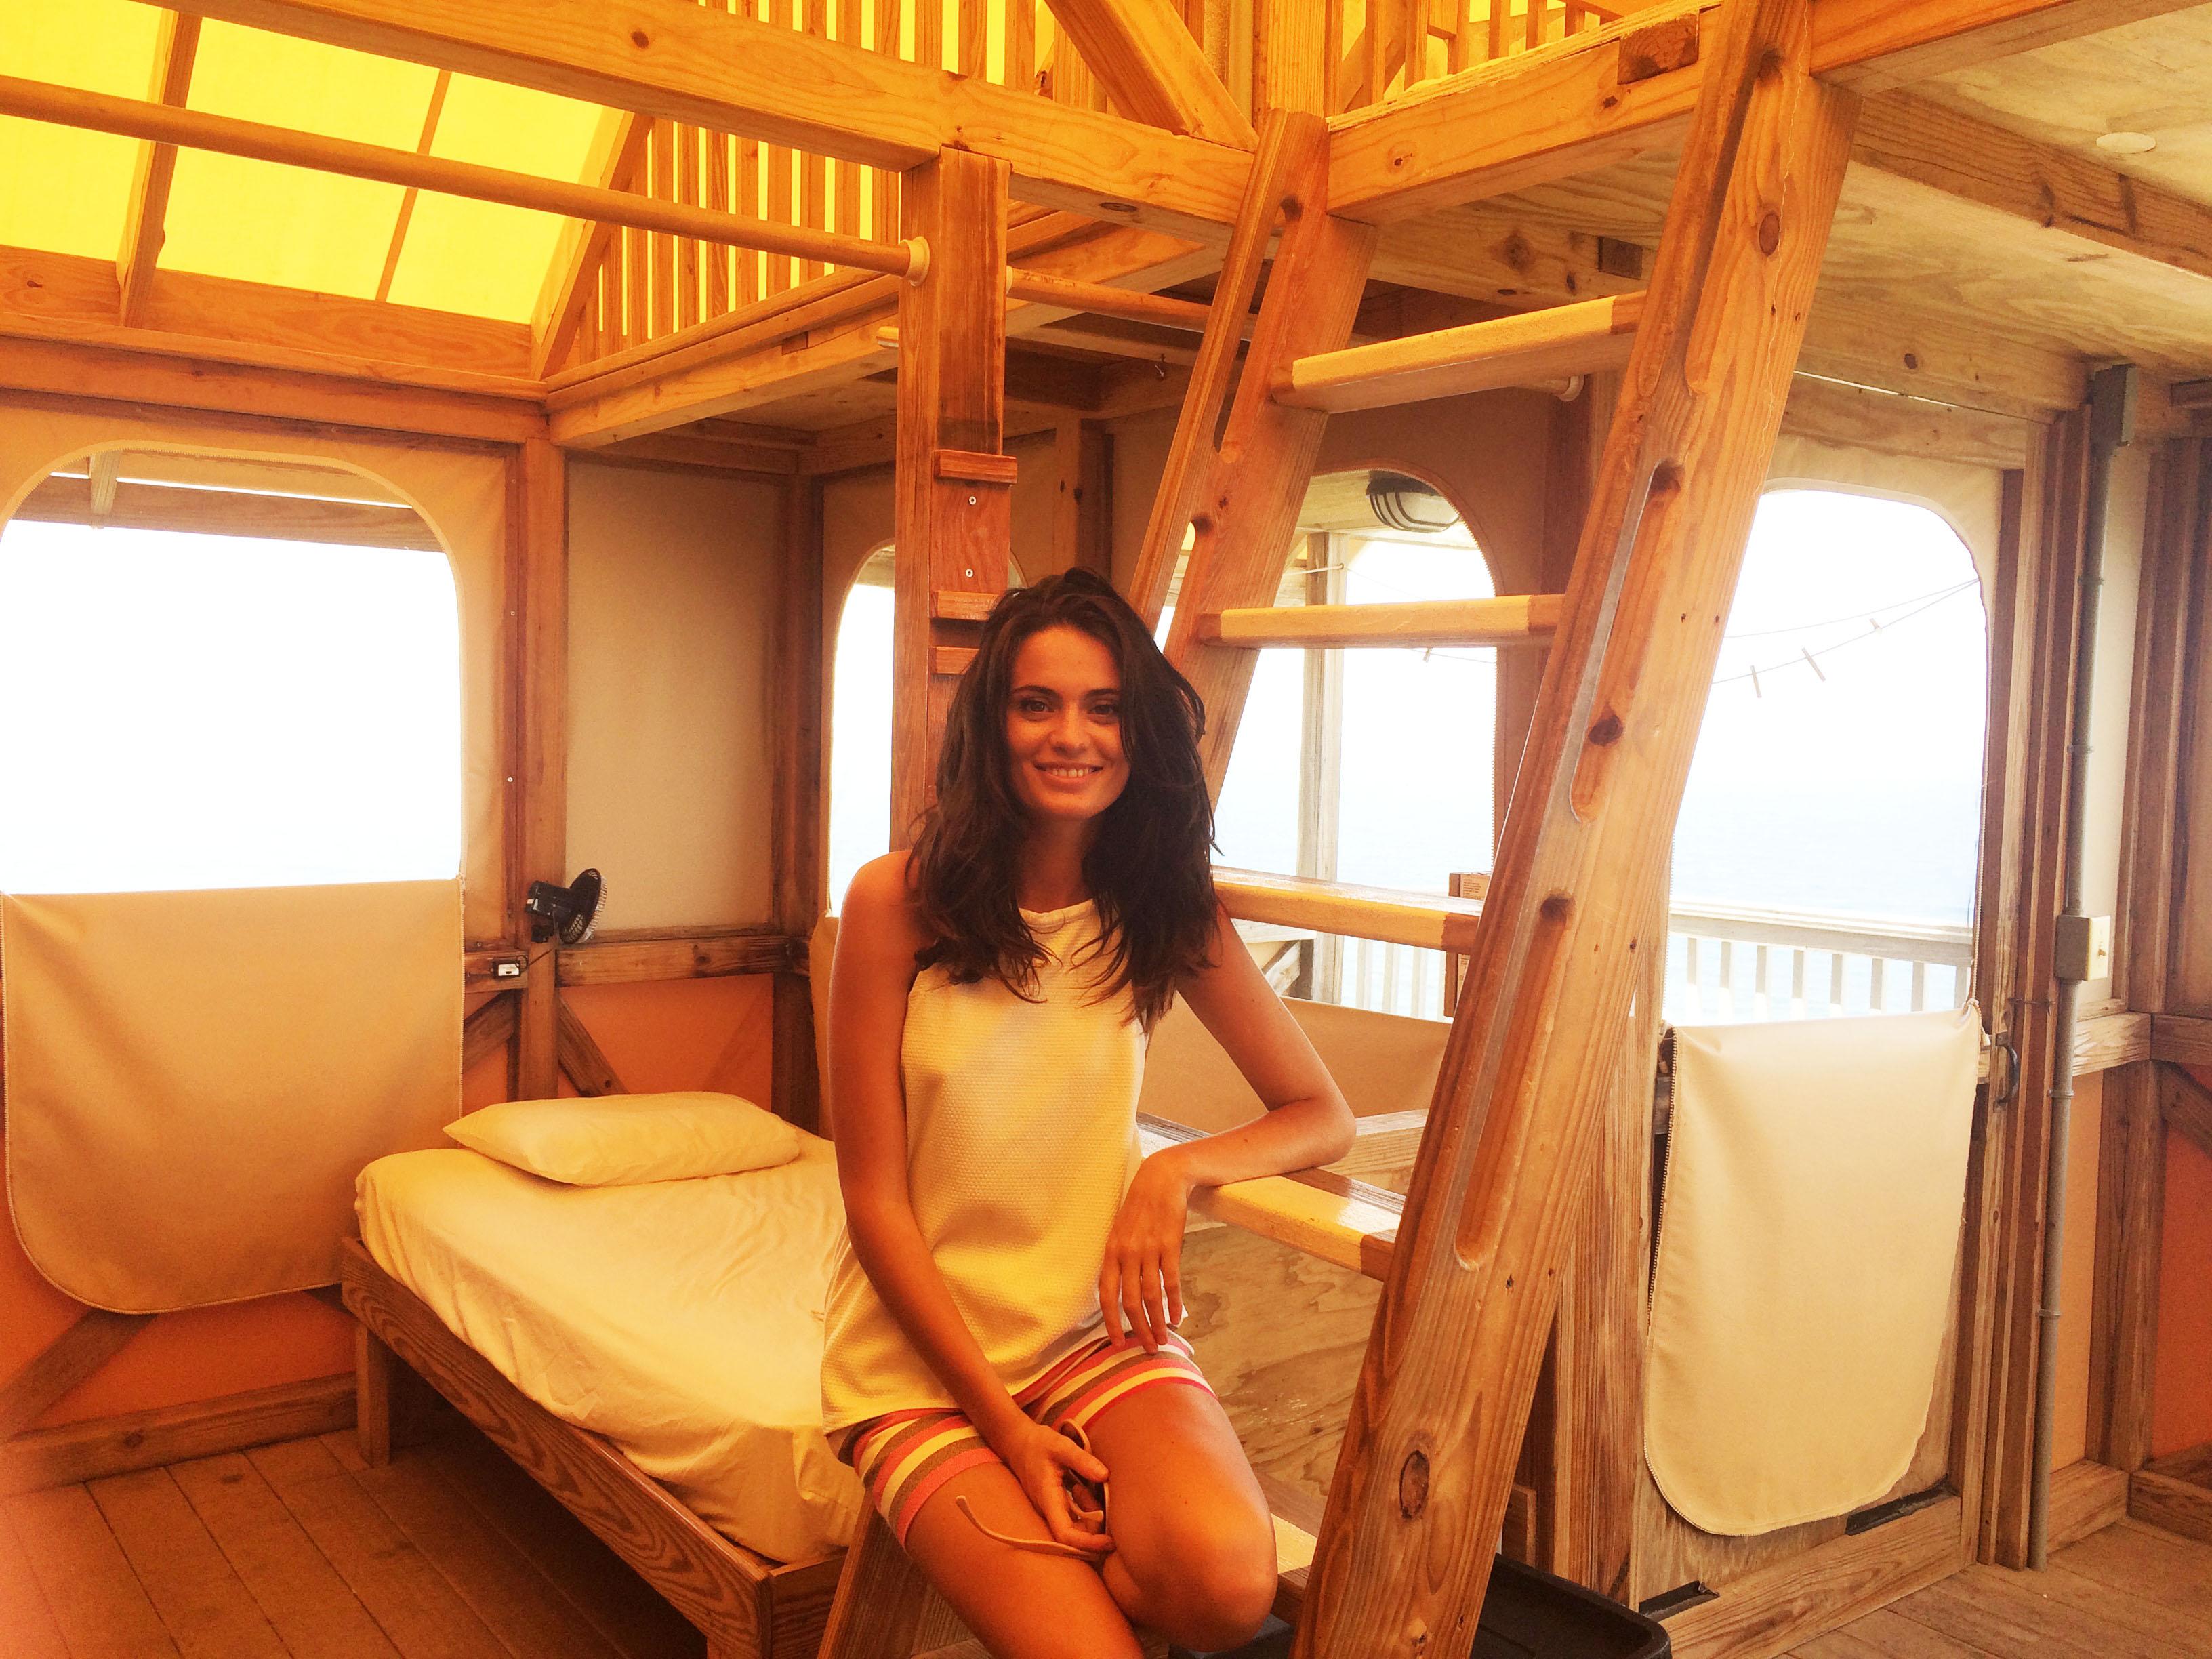 eco tents st john cinnamon bay beach st john the water. Black Bedroom Furniture Sets. Home Design Ideas